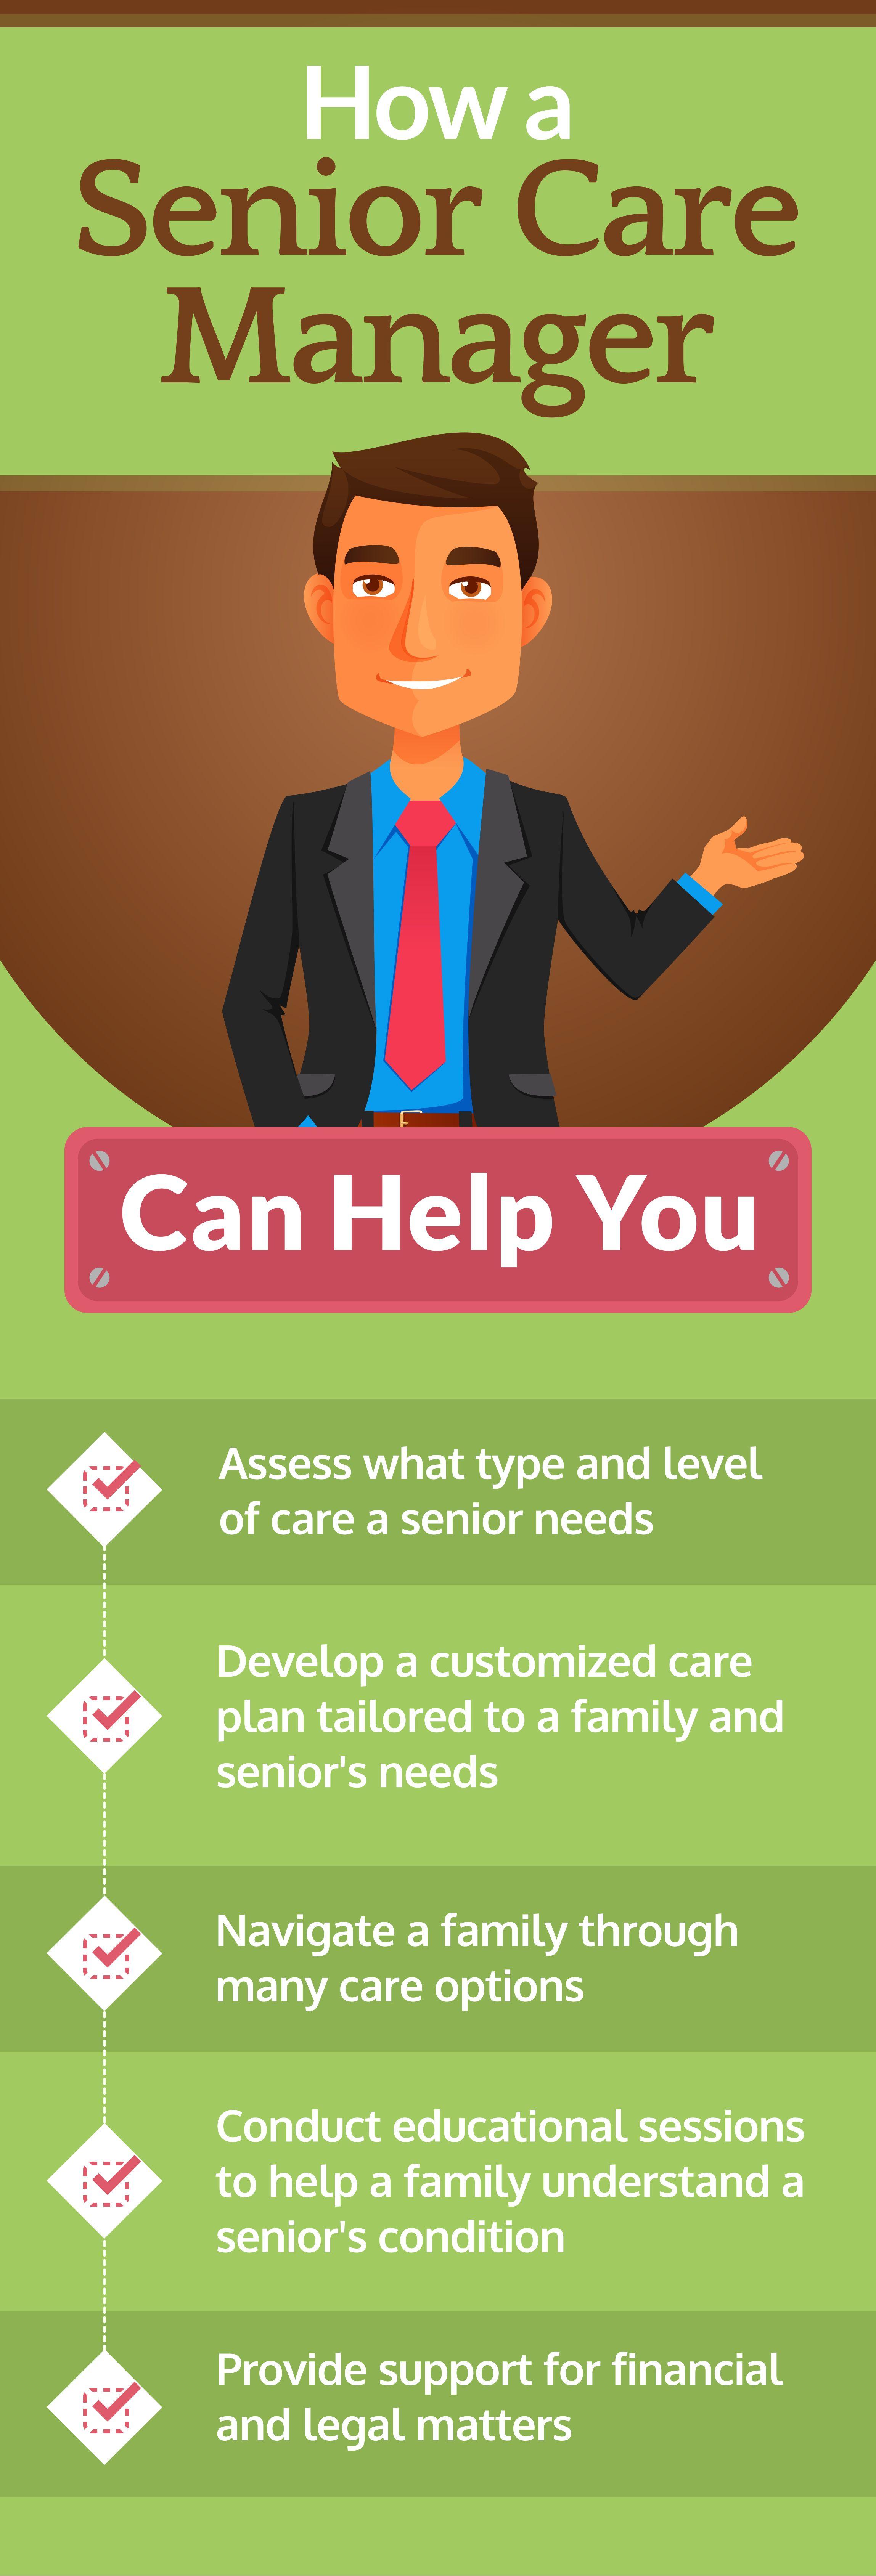 How a Senior Care Manager Can Help You Senior care, Care